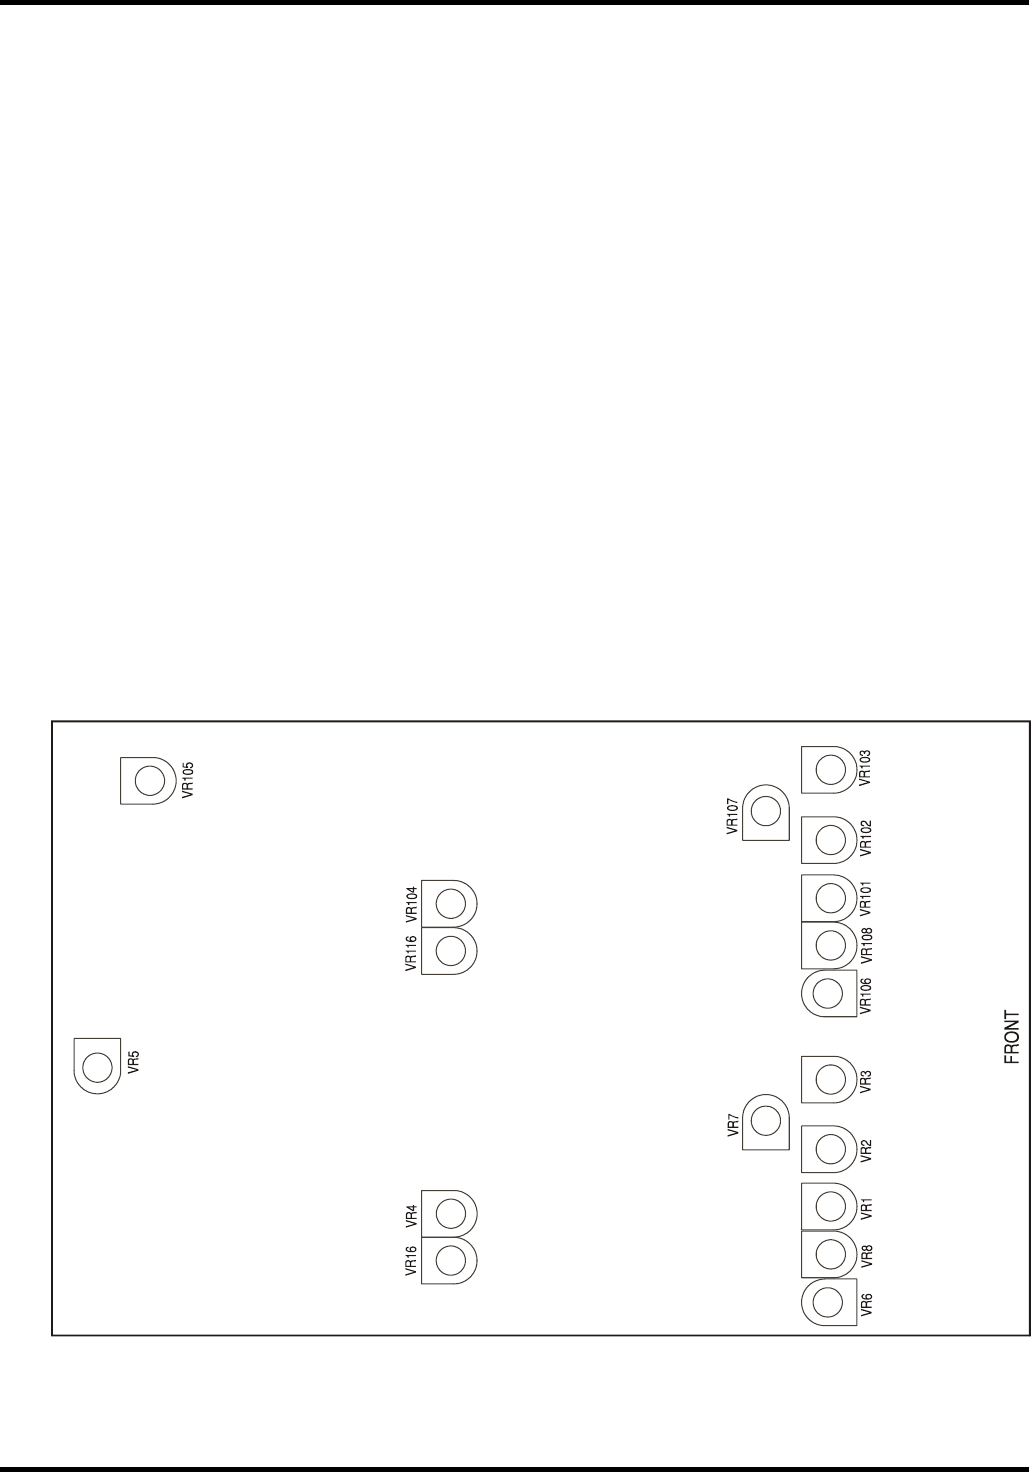 Ziemlich Fahrzeugdiagramme Fotos - Schaltplan Serie Circuit ...